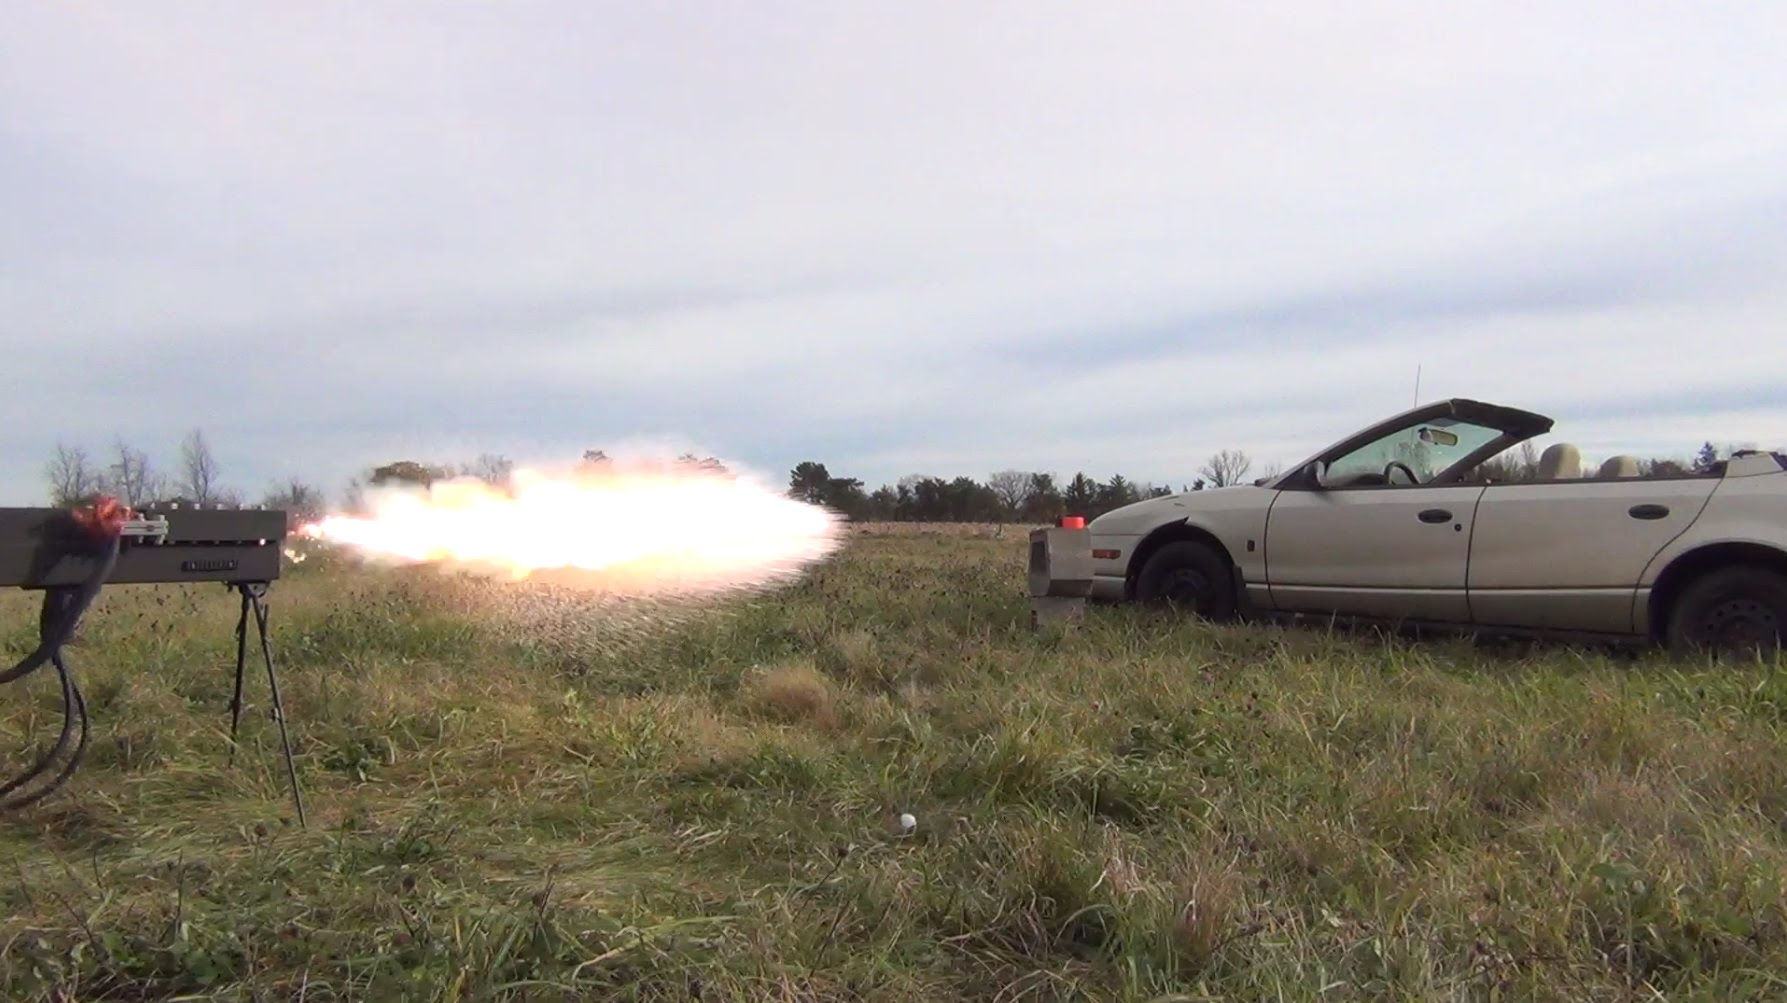 These Guys Built an Amazing Weapon - 250-Pound, 27,000 Joule Electric Railgun